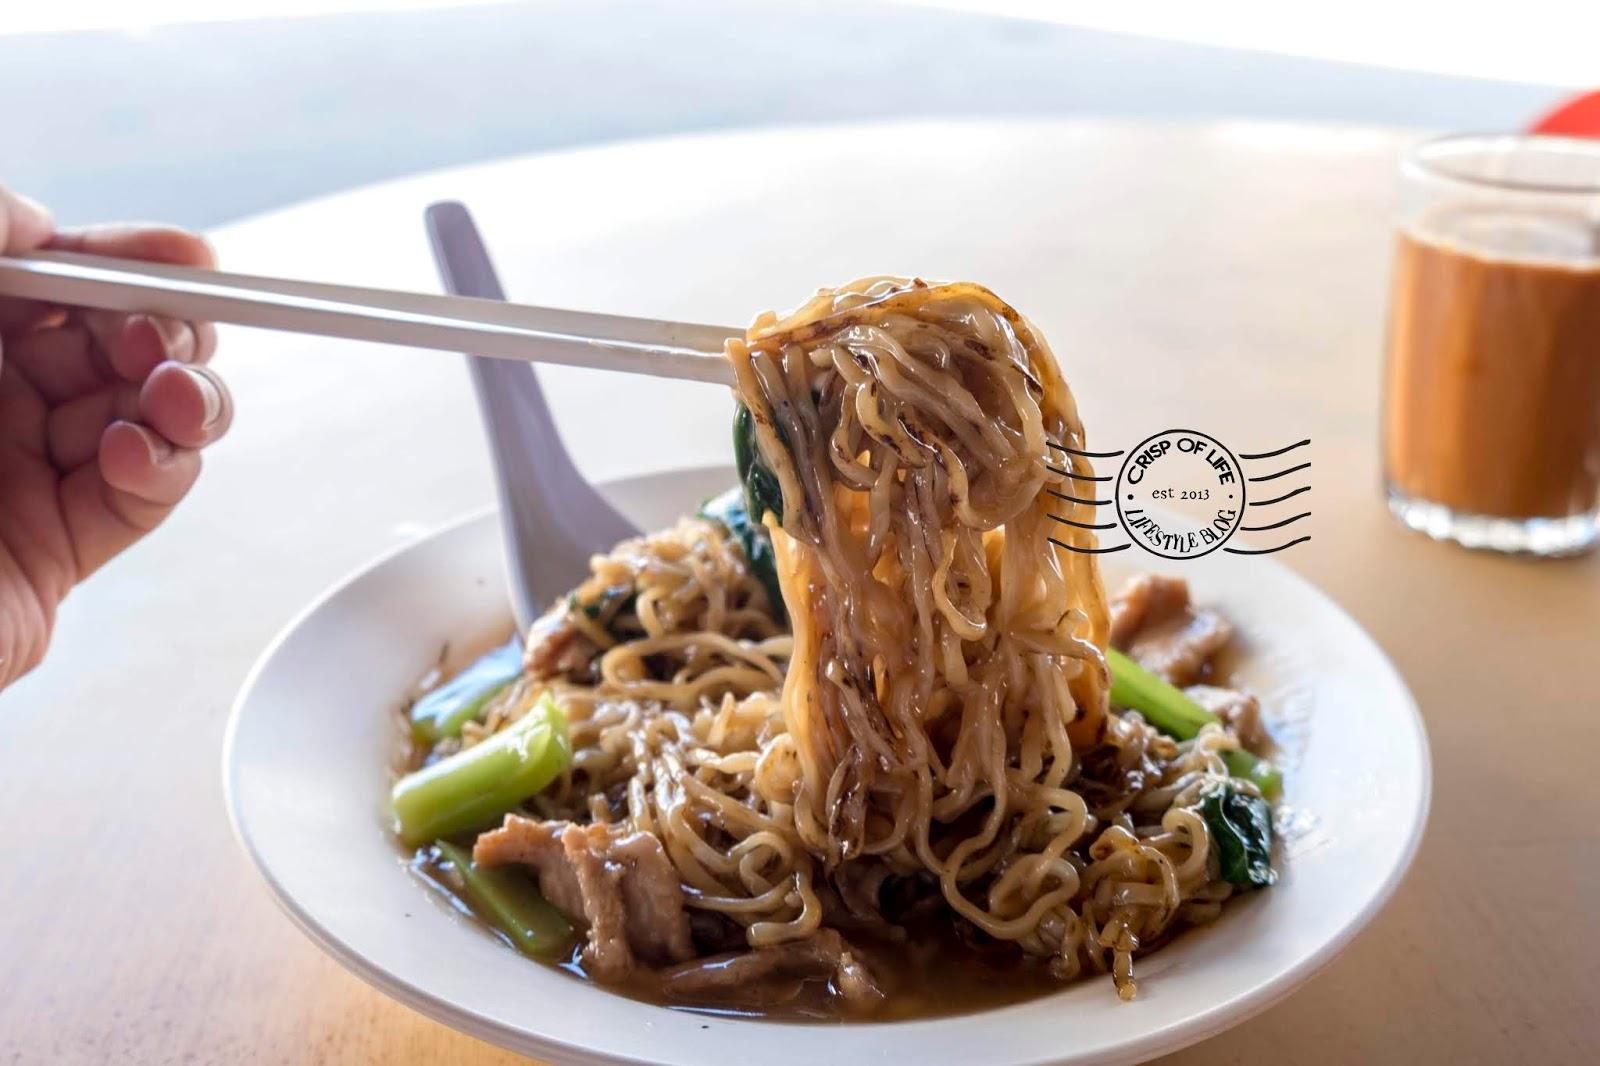 Beaufort Noodles @ New Restaurant Kim Wah, Beaufort